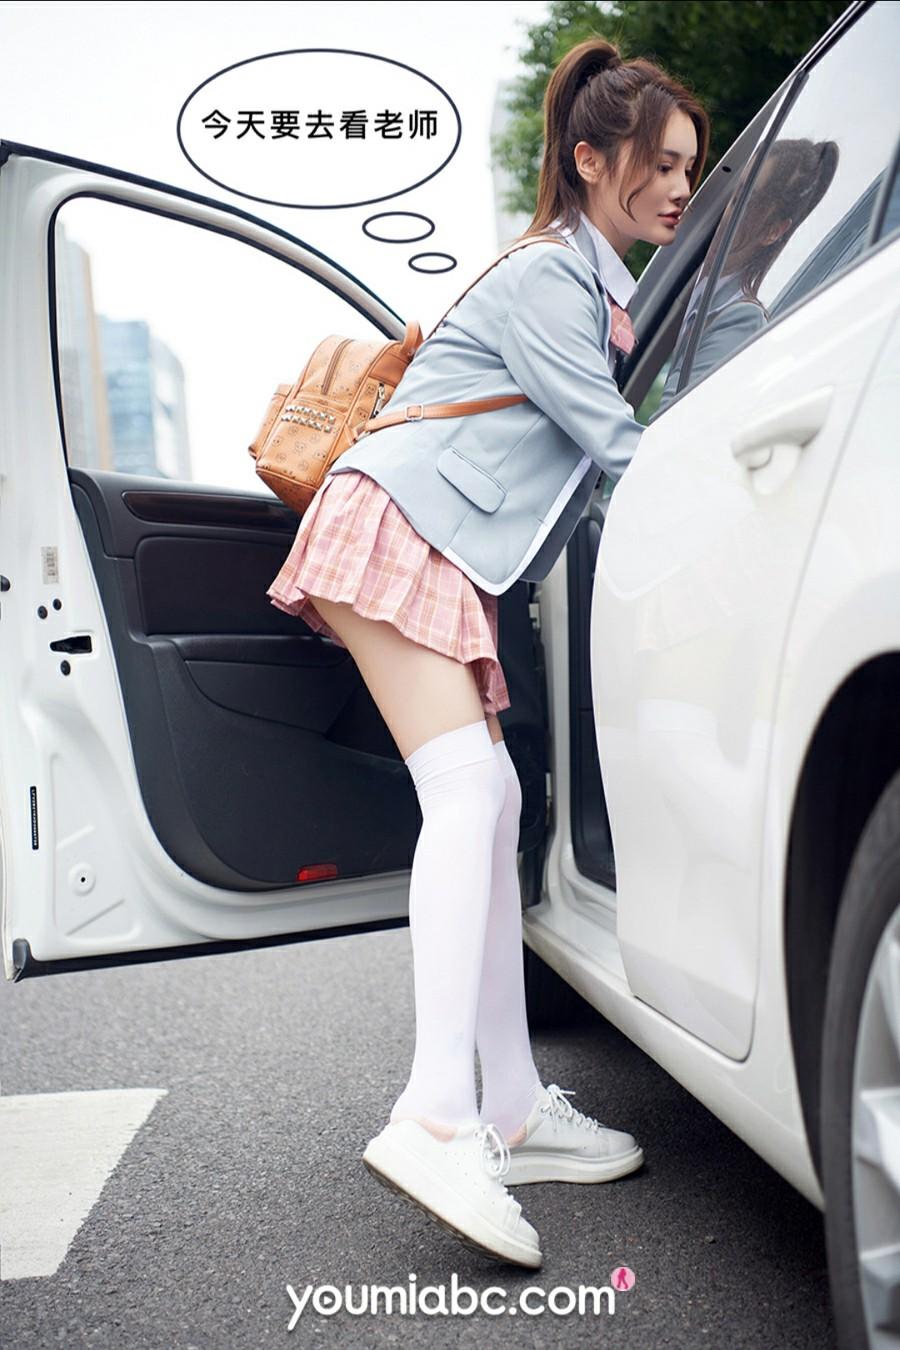 [YouMi尤蜜] 2020.09.29 尤蜜合辑 被调教の训练生2:私密约会 第2张